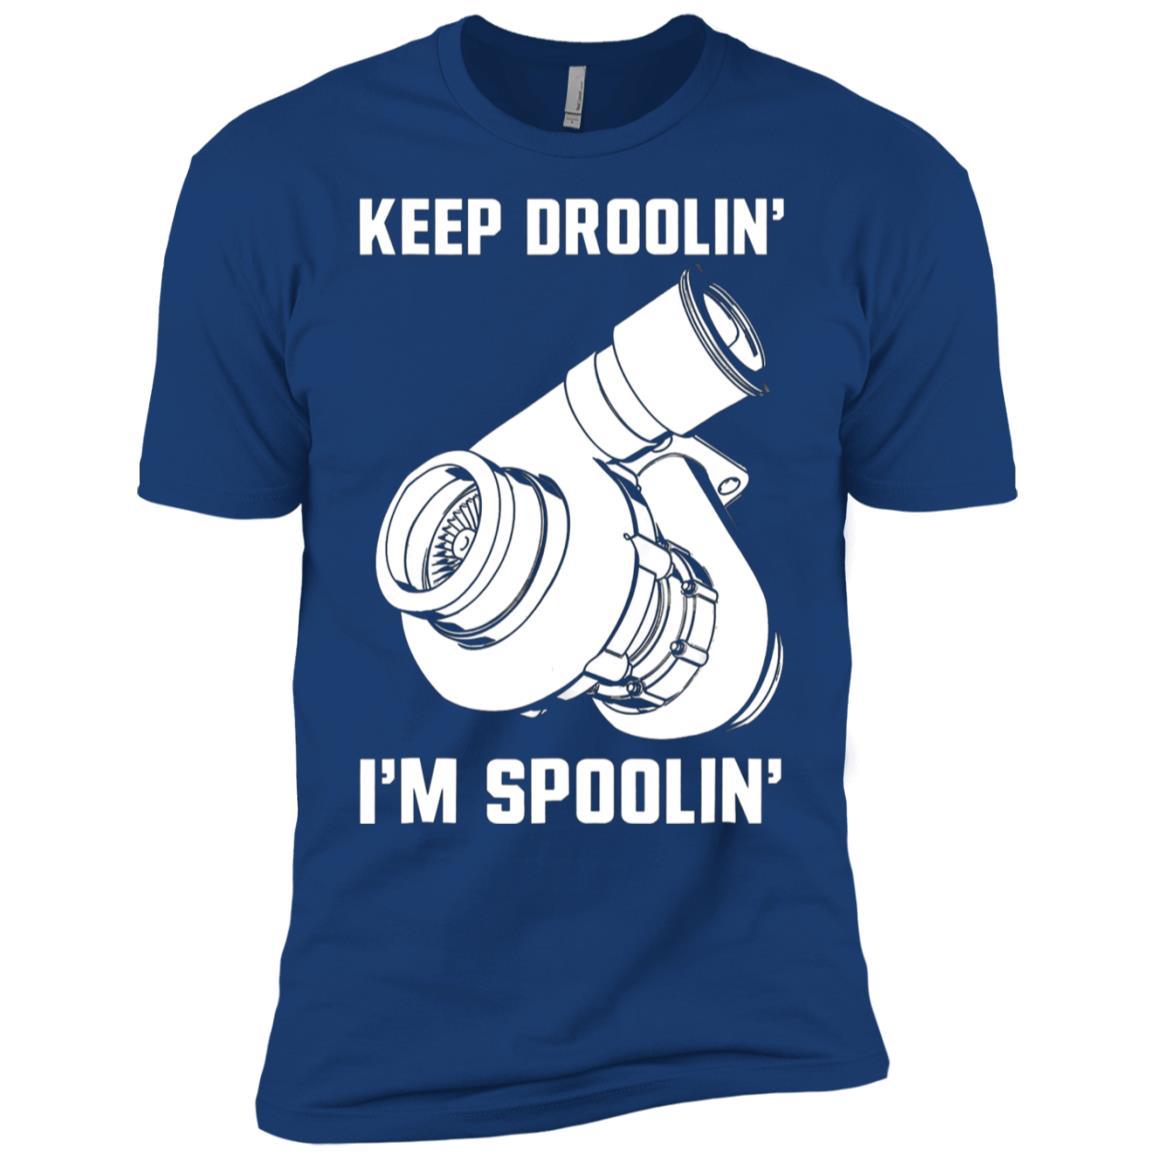 Keep Droolin' I'm Spoolin' Diesel Truck Car Men Short Sleeve T-Shirt